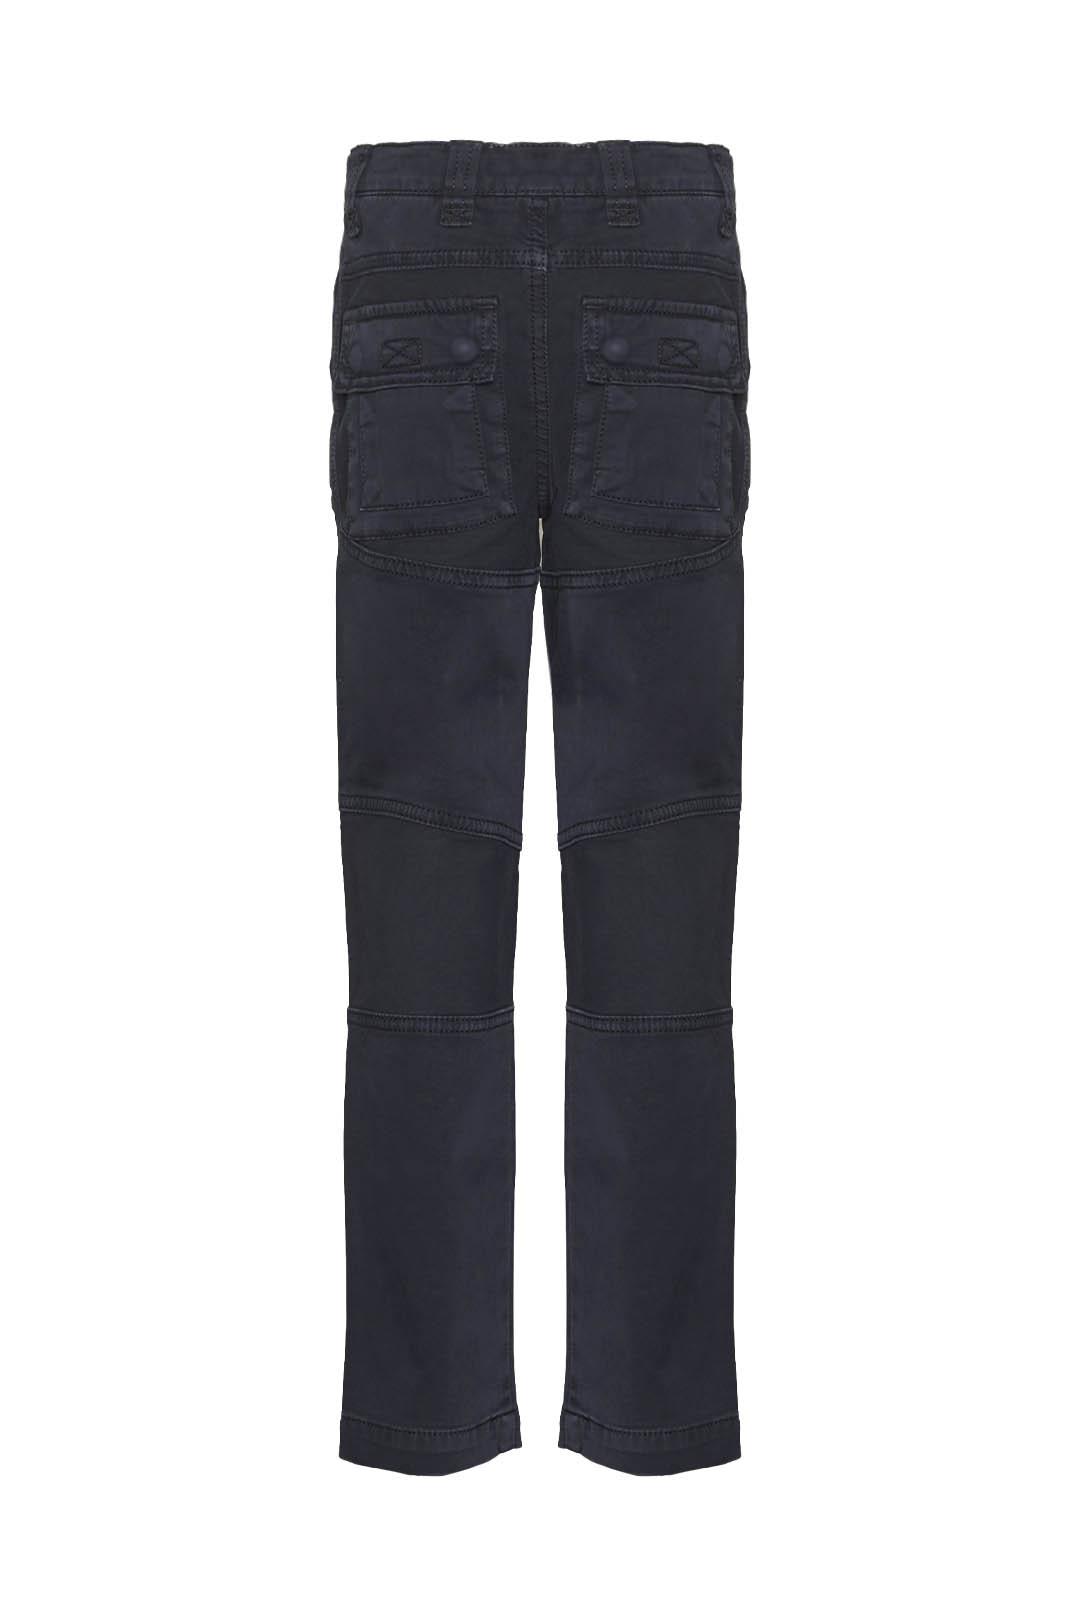 Pantalon iconique Anti-G                 2